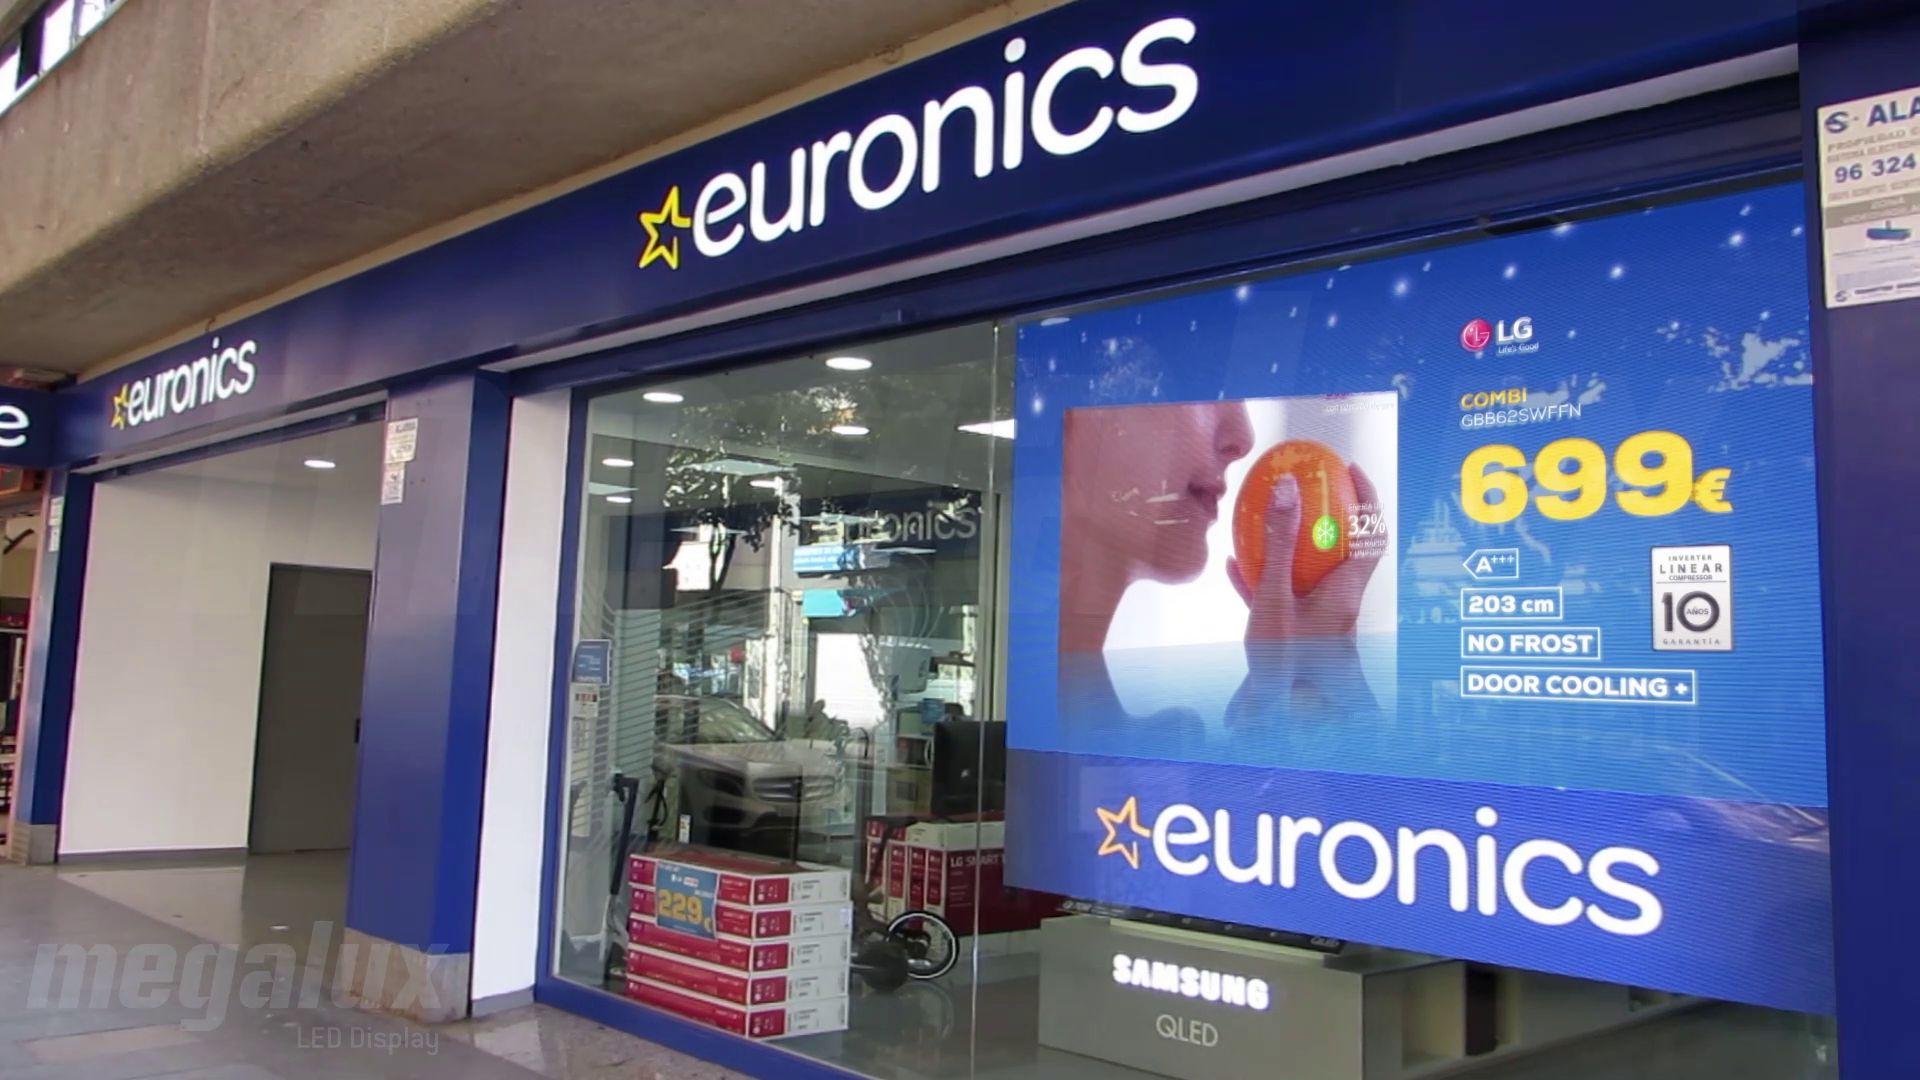 La cadena Euronics se hace notar con pantalla LED Megalux de gran formato